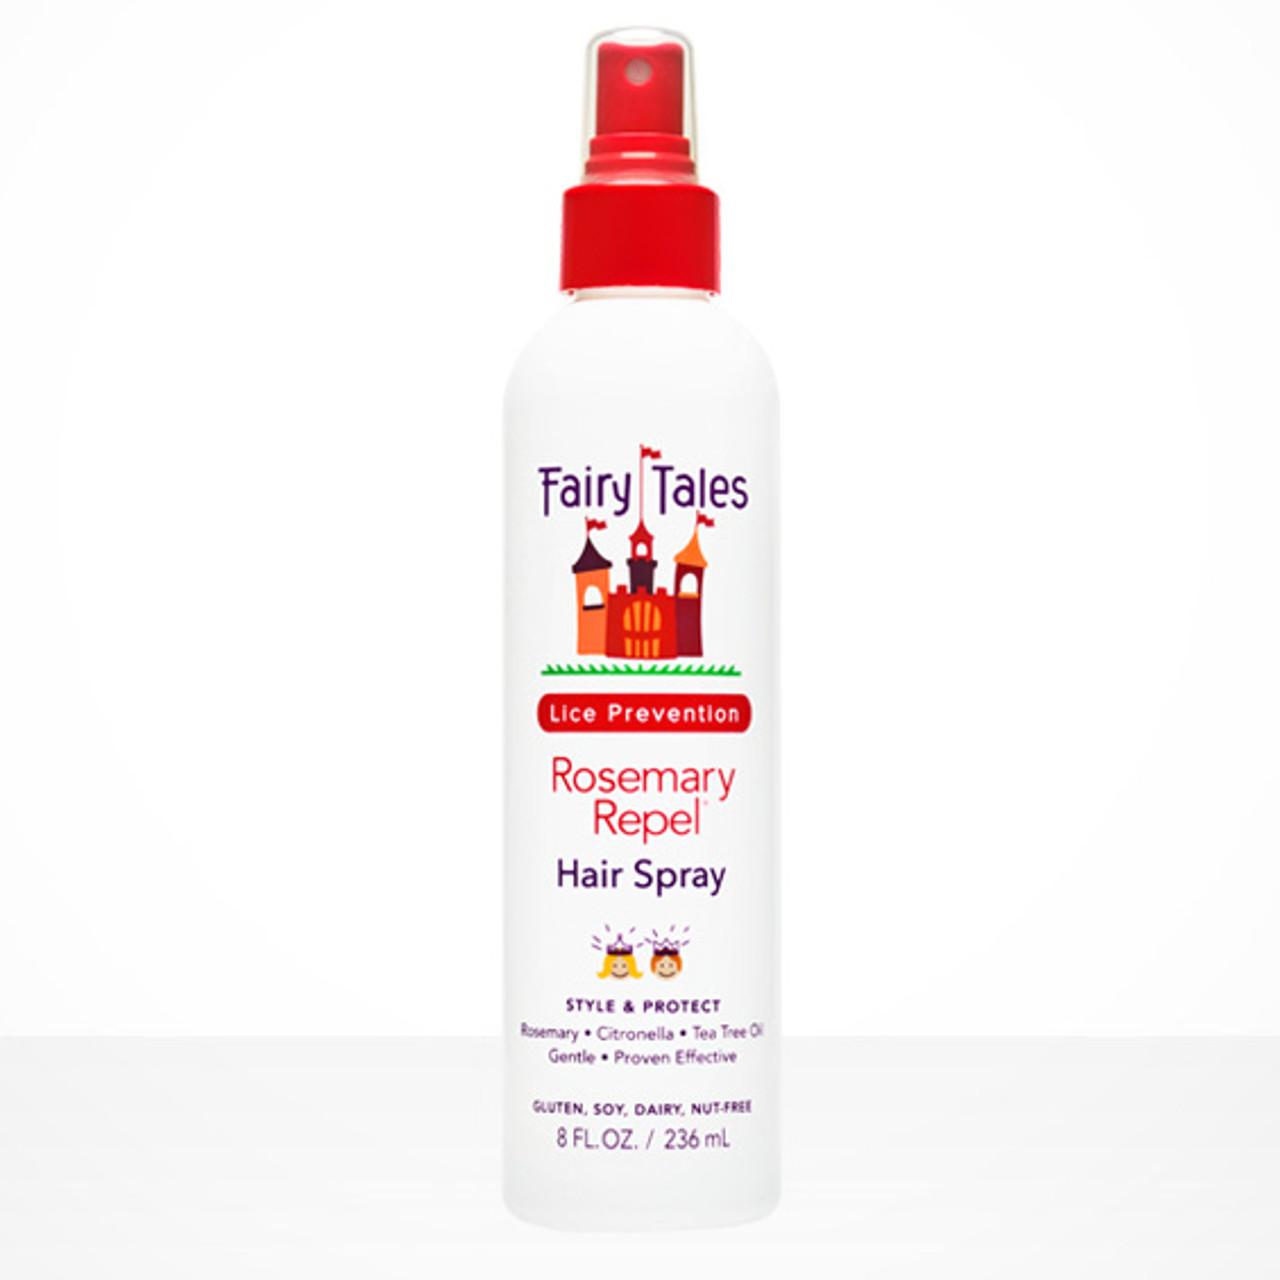 Fairy Tale Rosemary Repel Hairspray